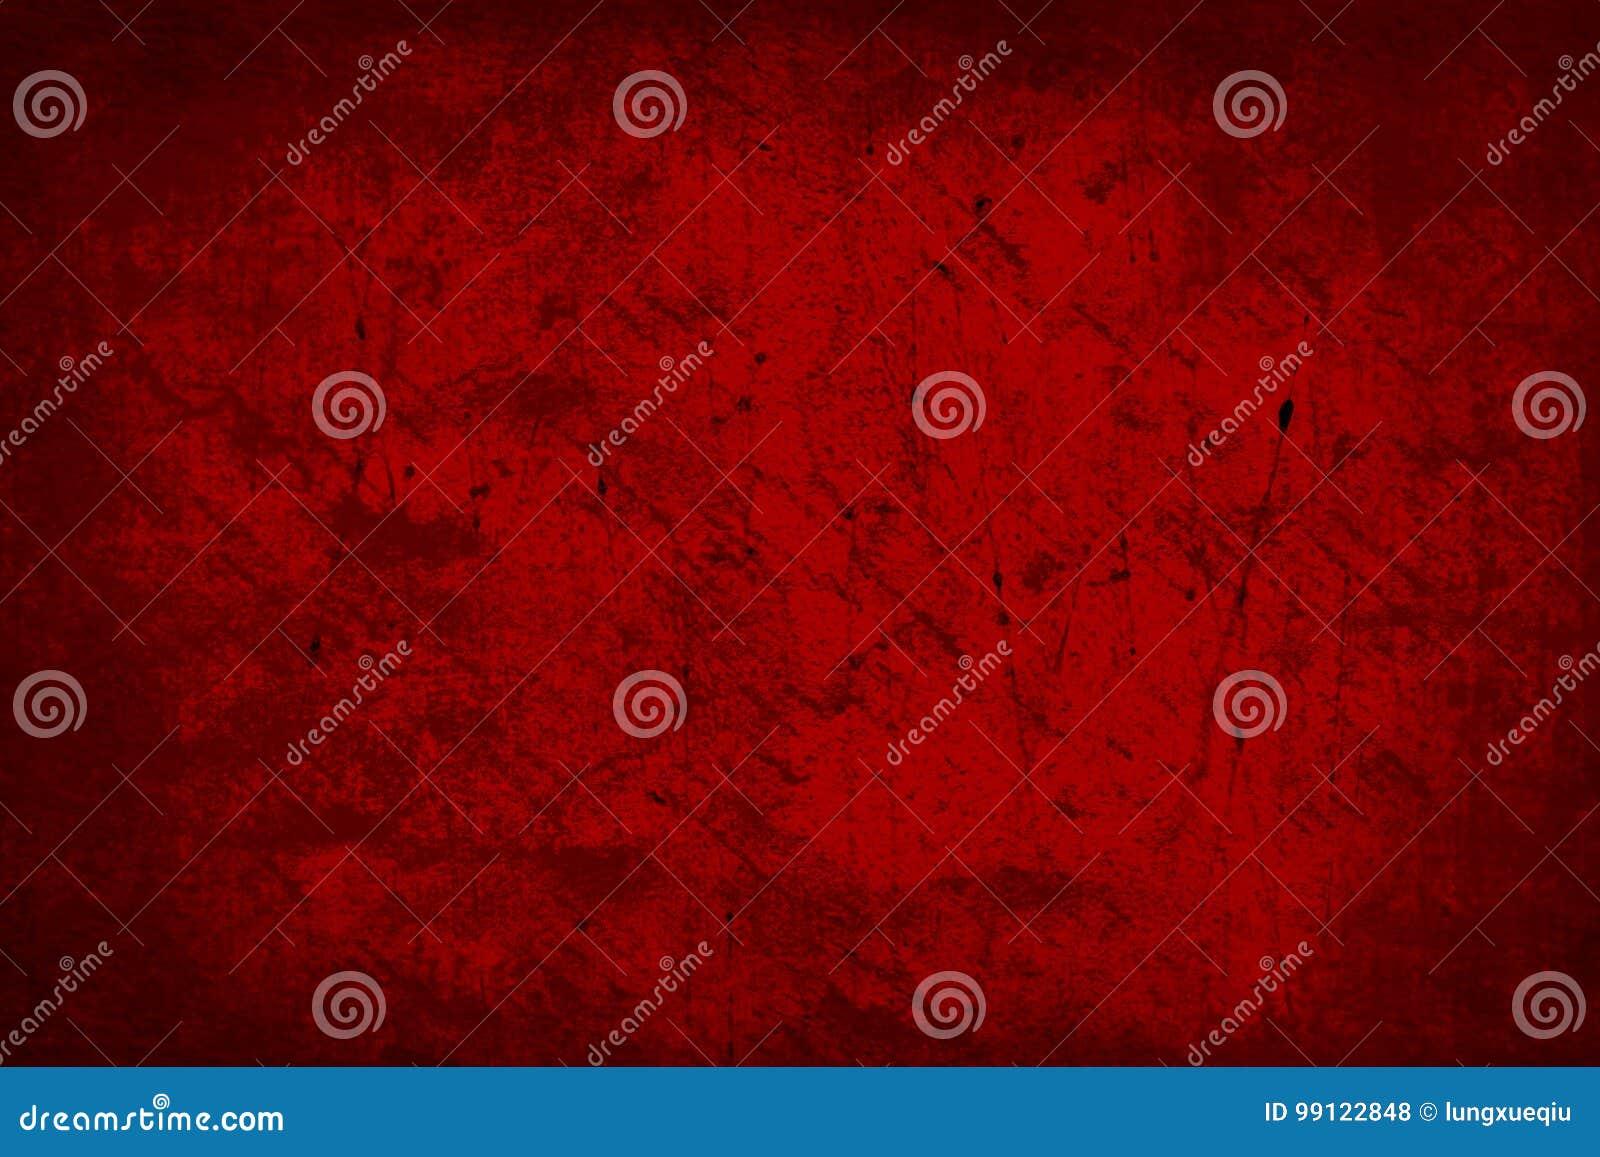 Dark Red Old Grunge Abstract Texture Background Wallpaper